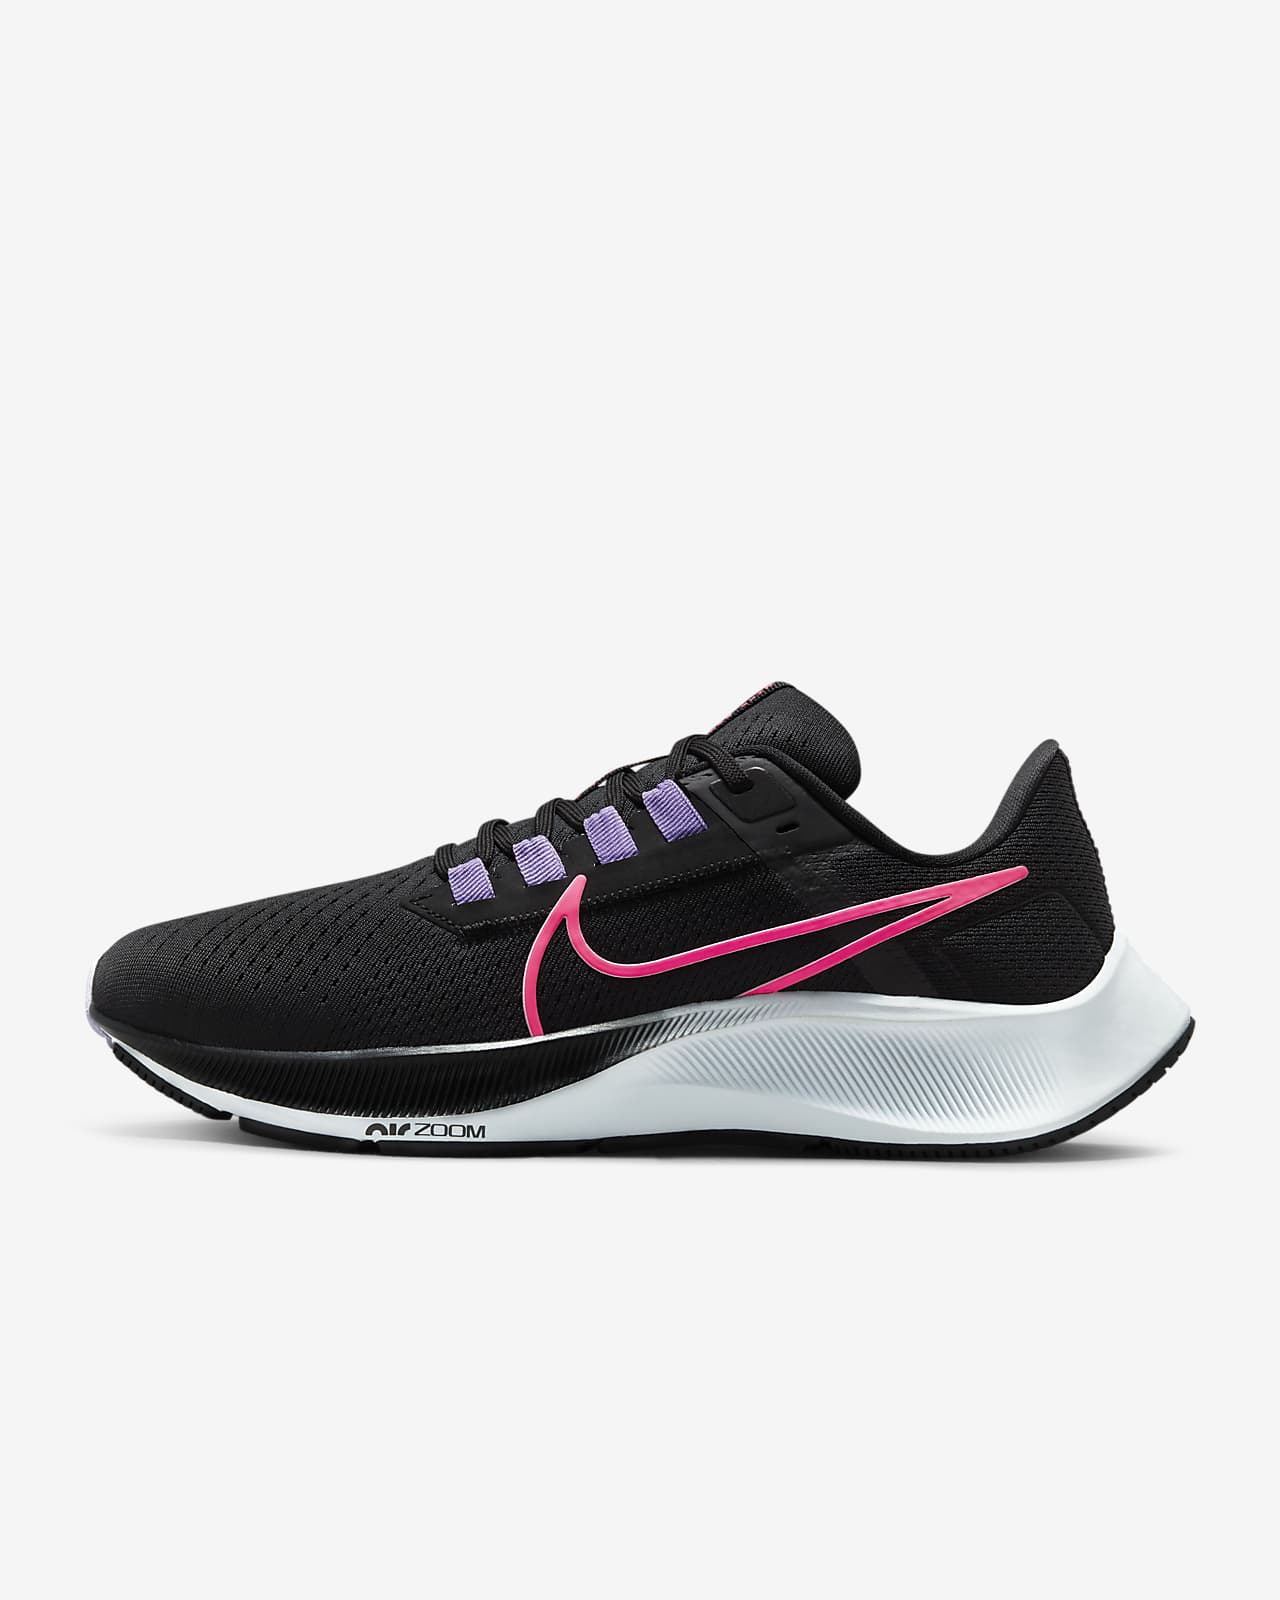 Löparskor Nike Air Zoom Pegasus 38 för kvinnor